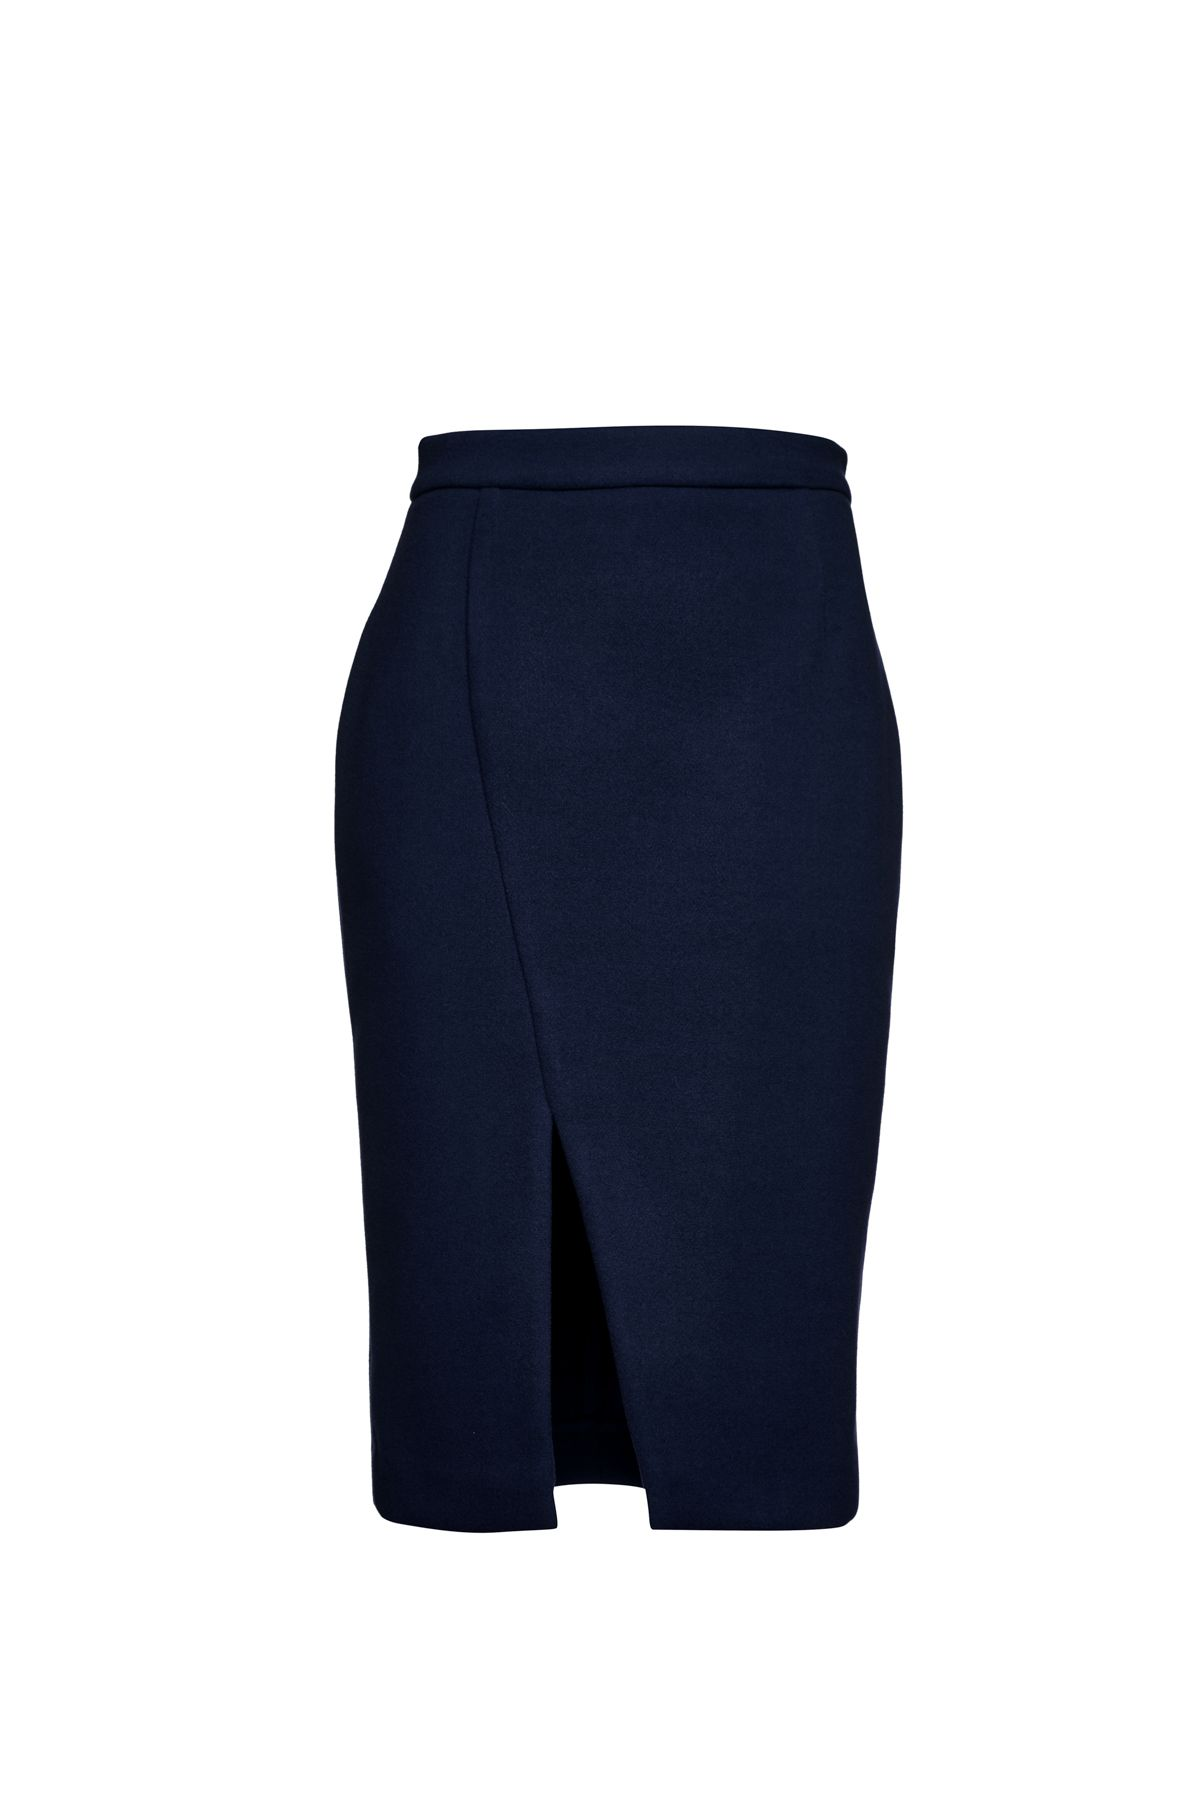 Navy Blue Mouflon Pencil Skirt